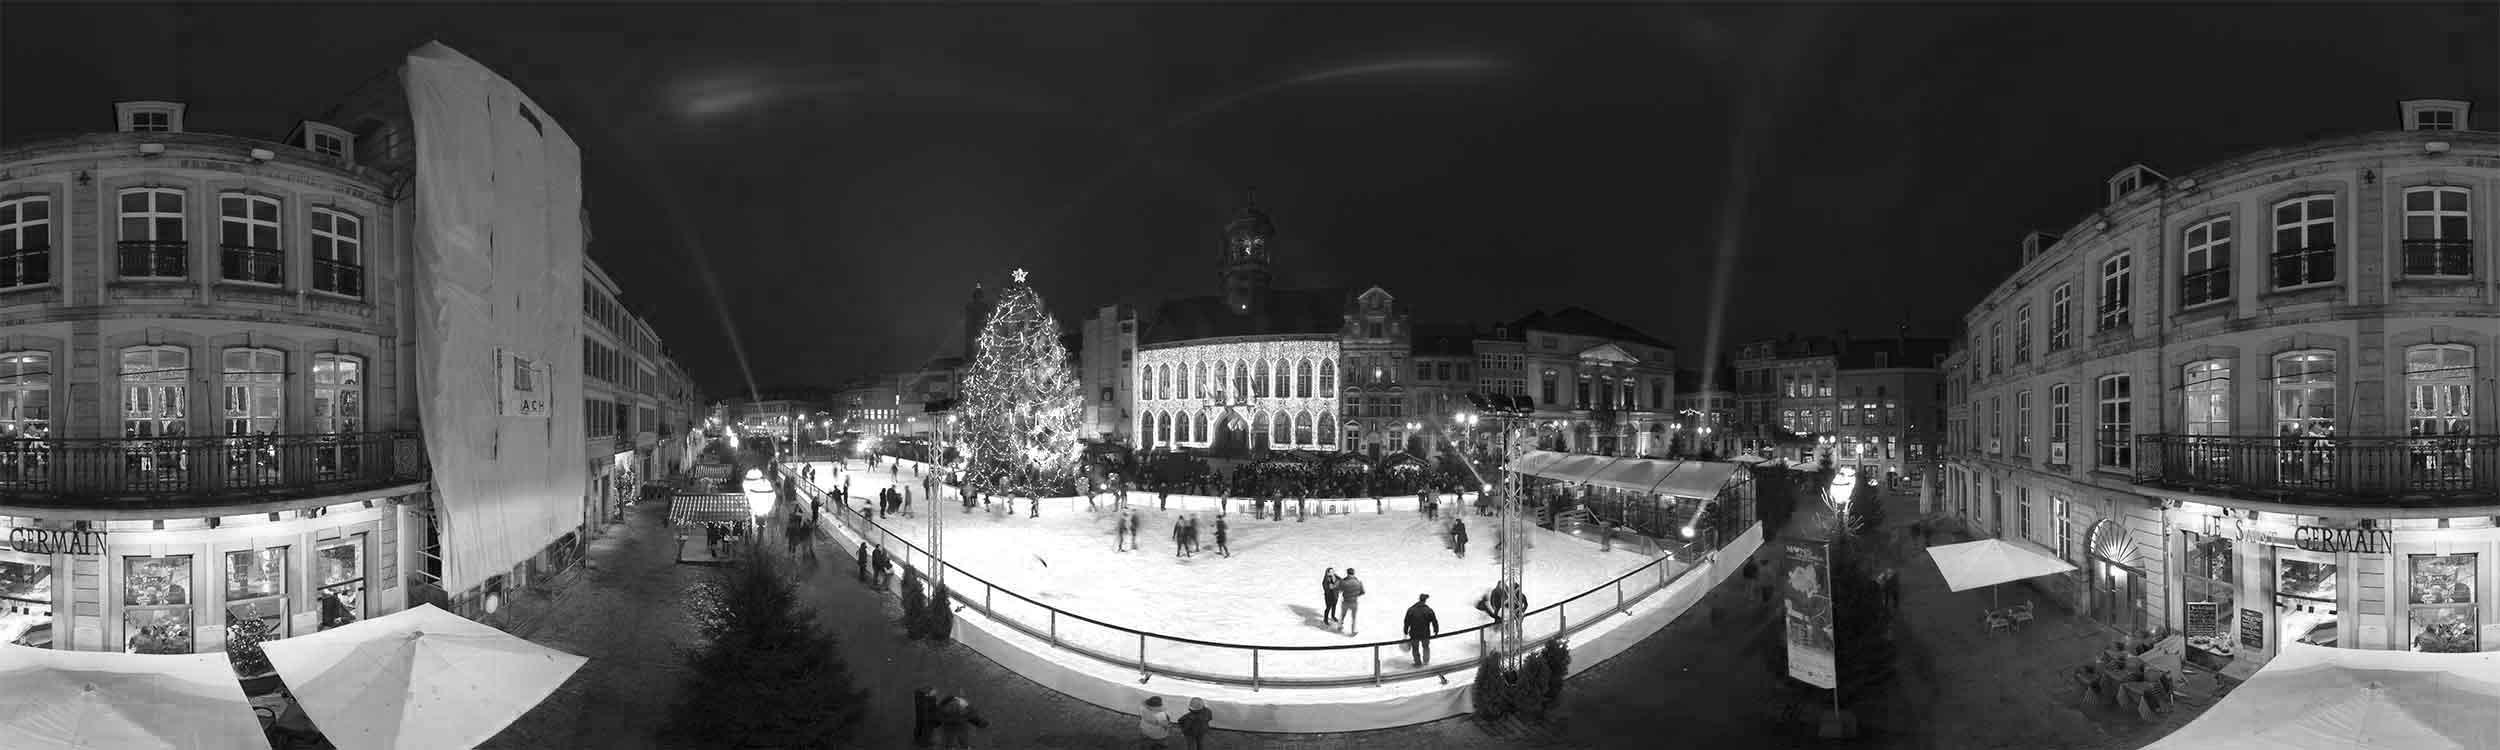 Mons coeur en neige visite virtuelle vue 360  black and white